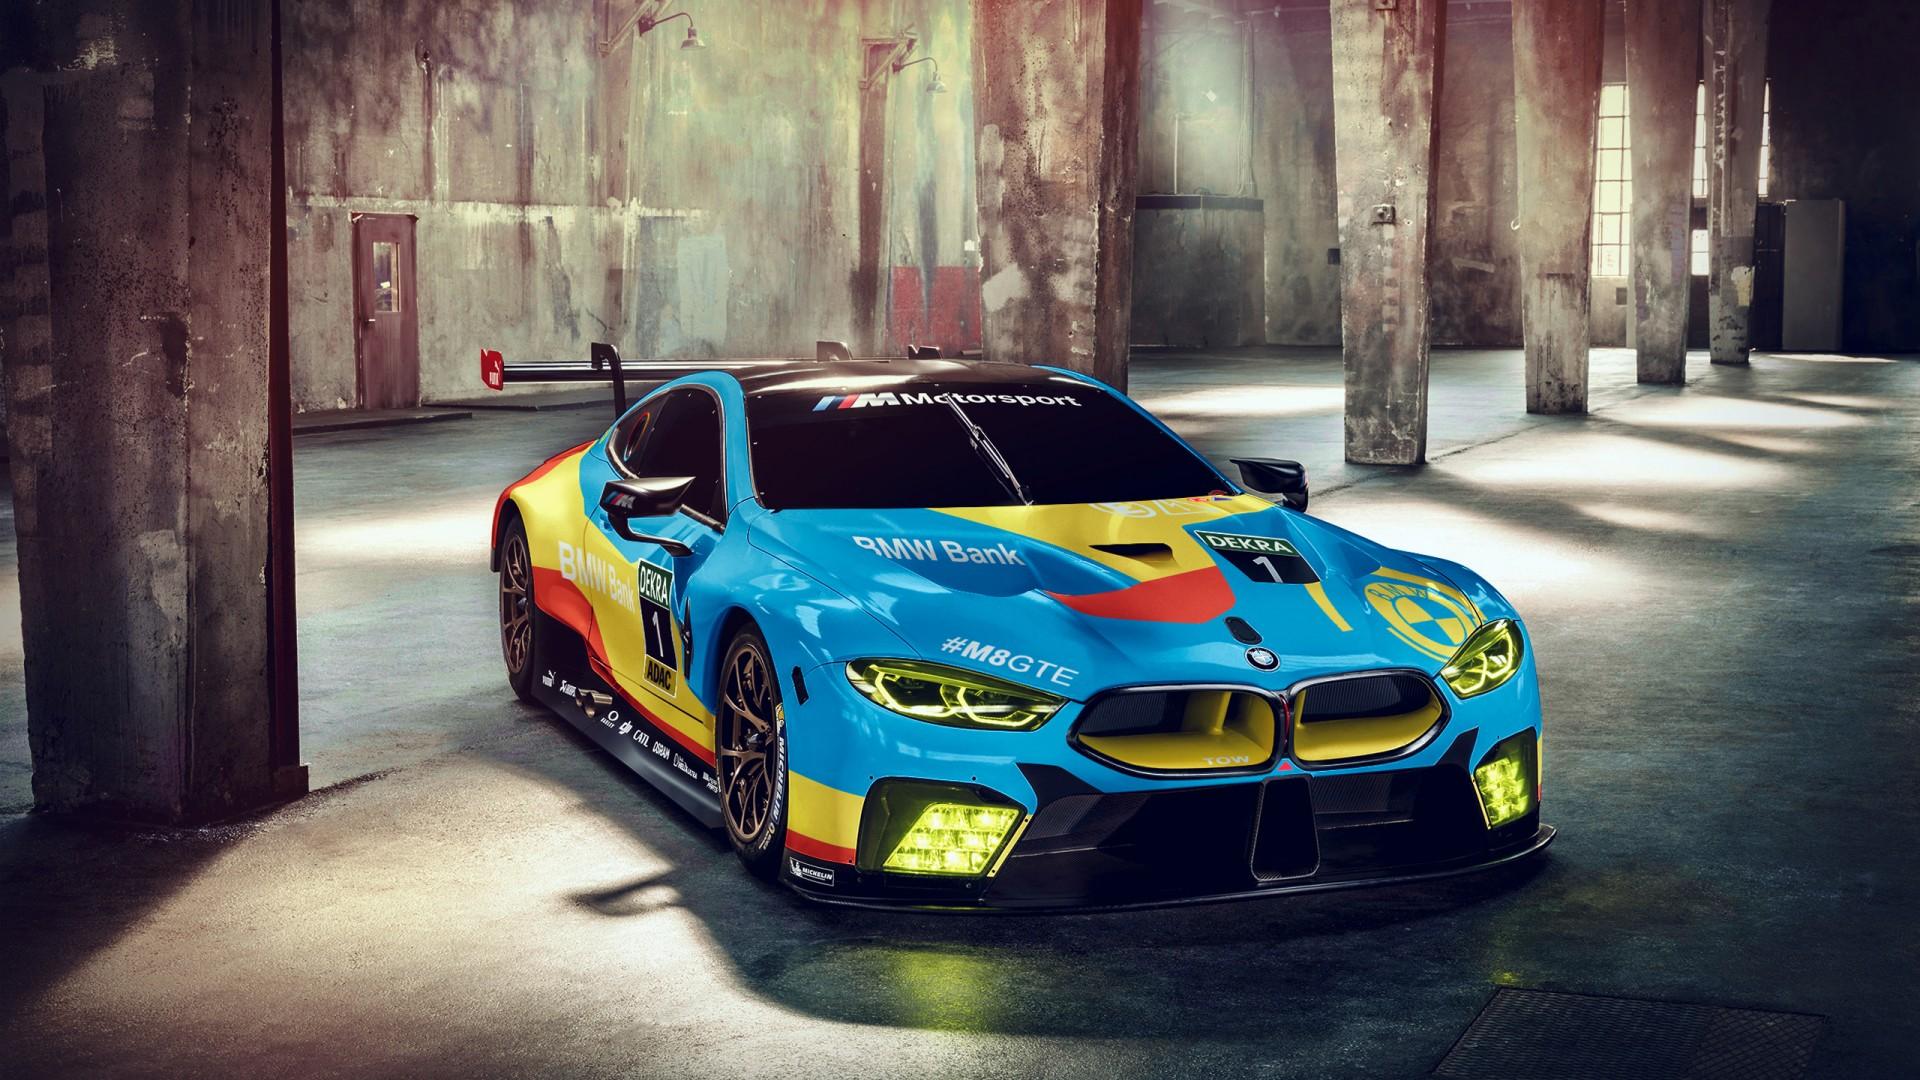 BMW M8 GTE 2018 Wallpaper HD Car Wallpapers ID 9270